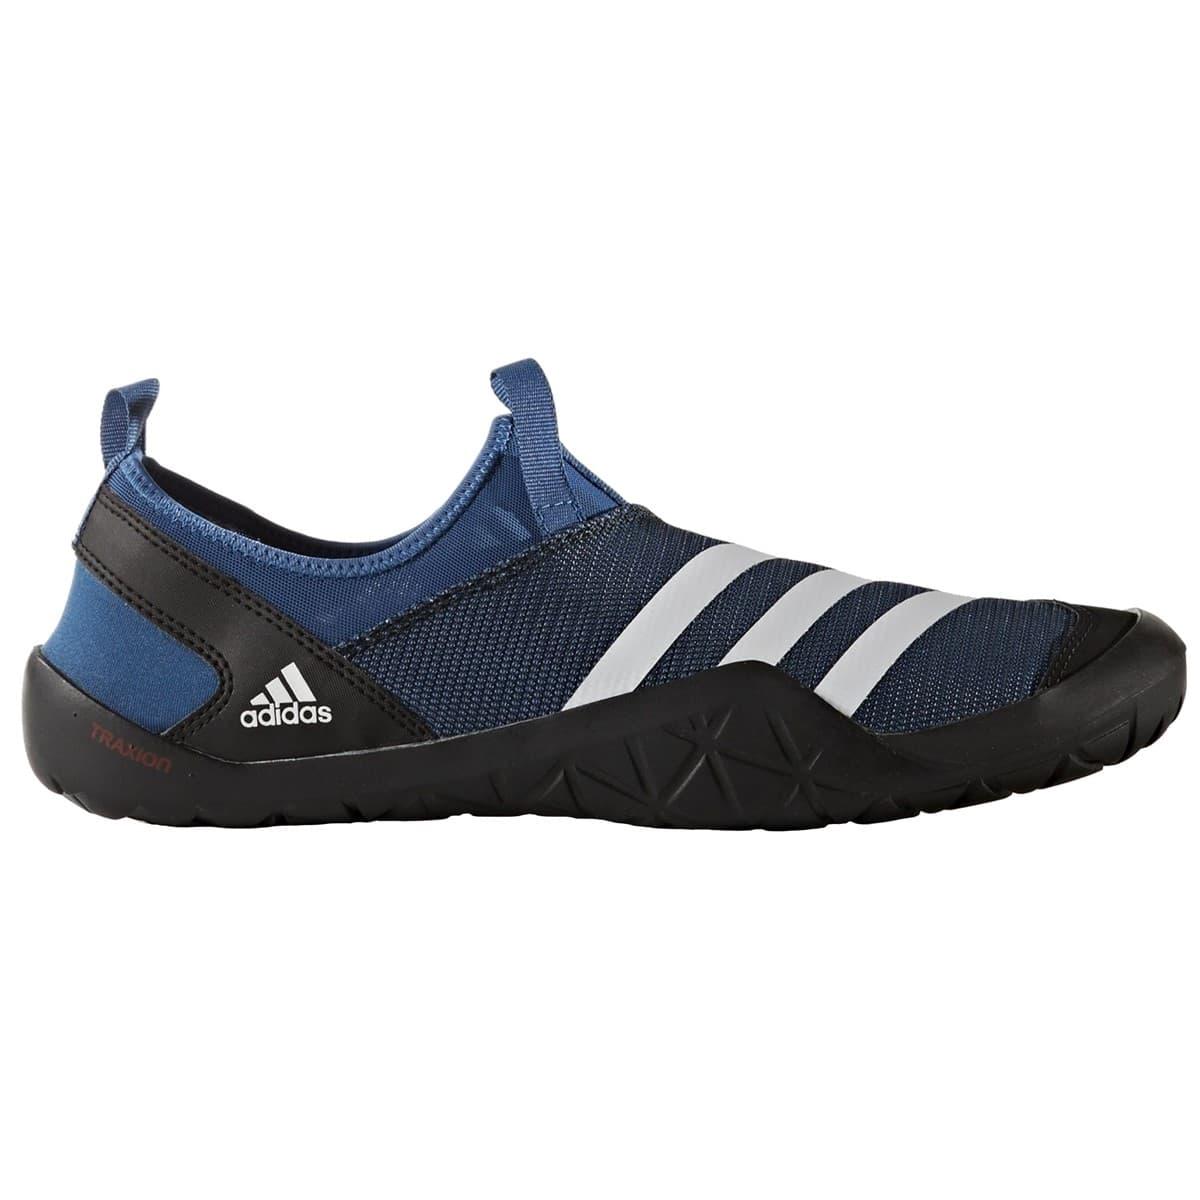 Climacool Jawpaw Mavi Su Ayakkabısı